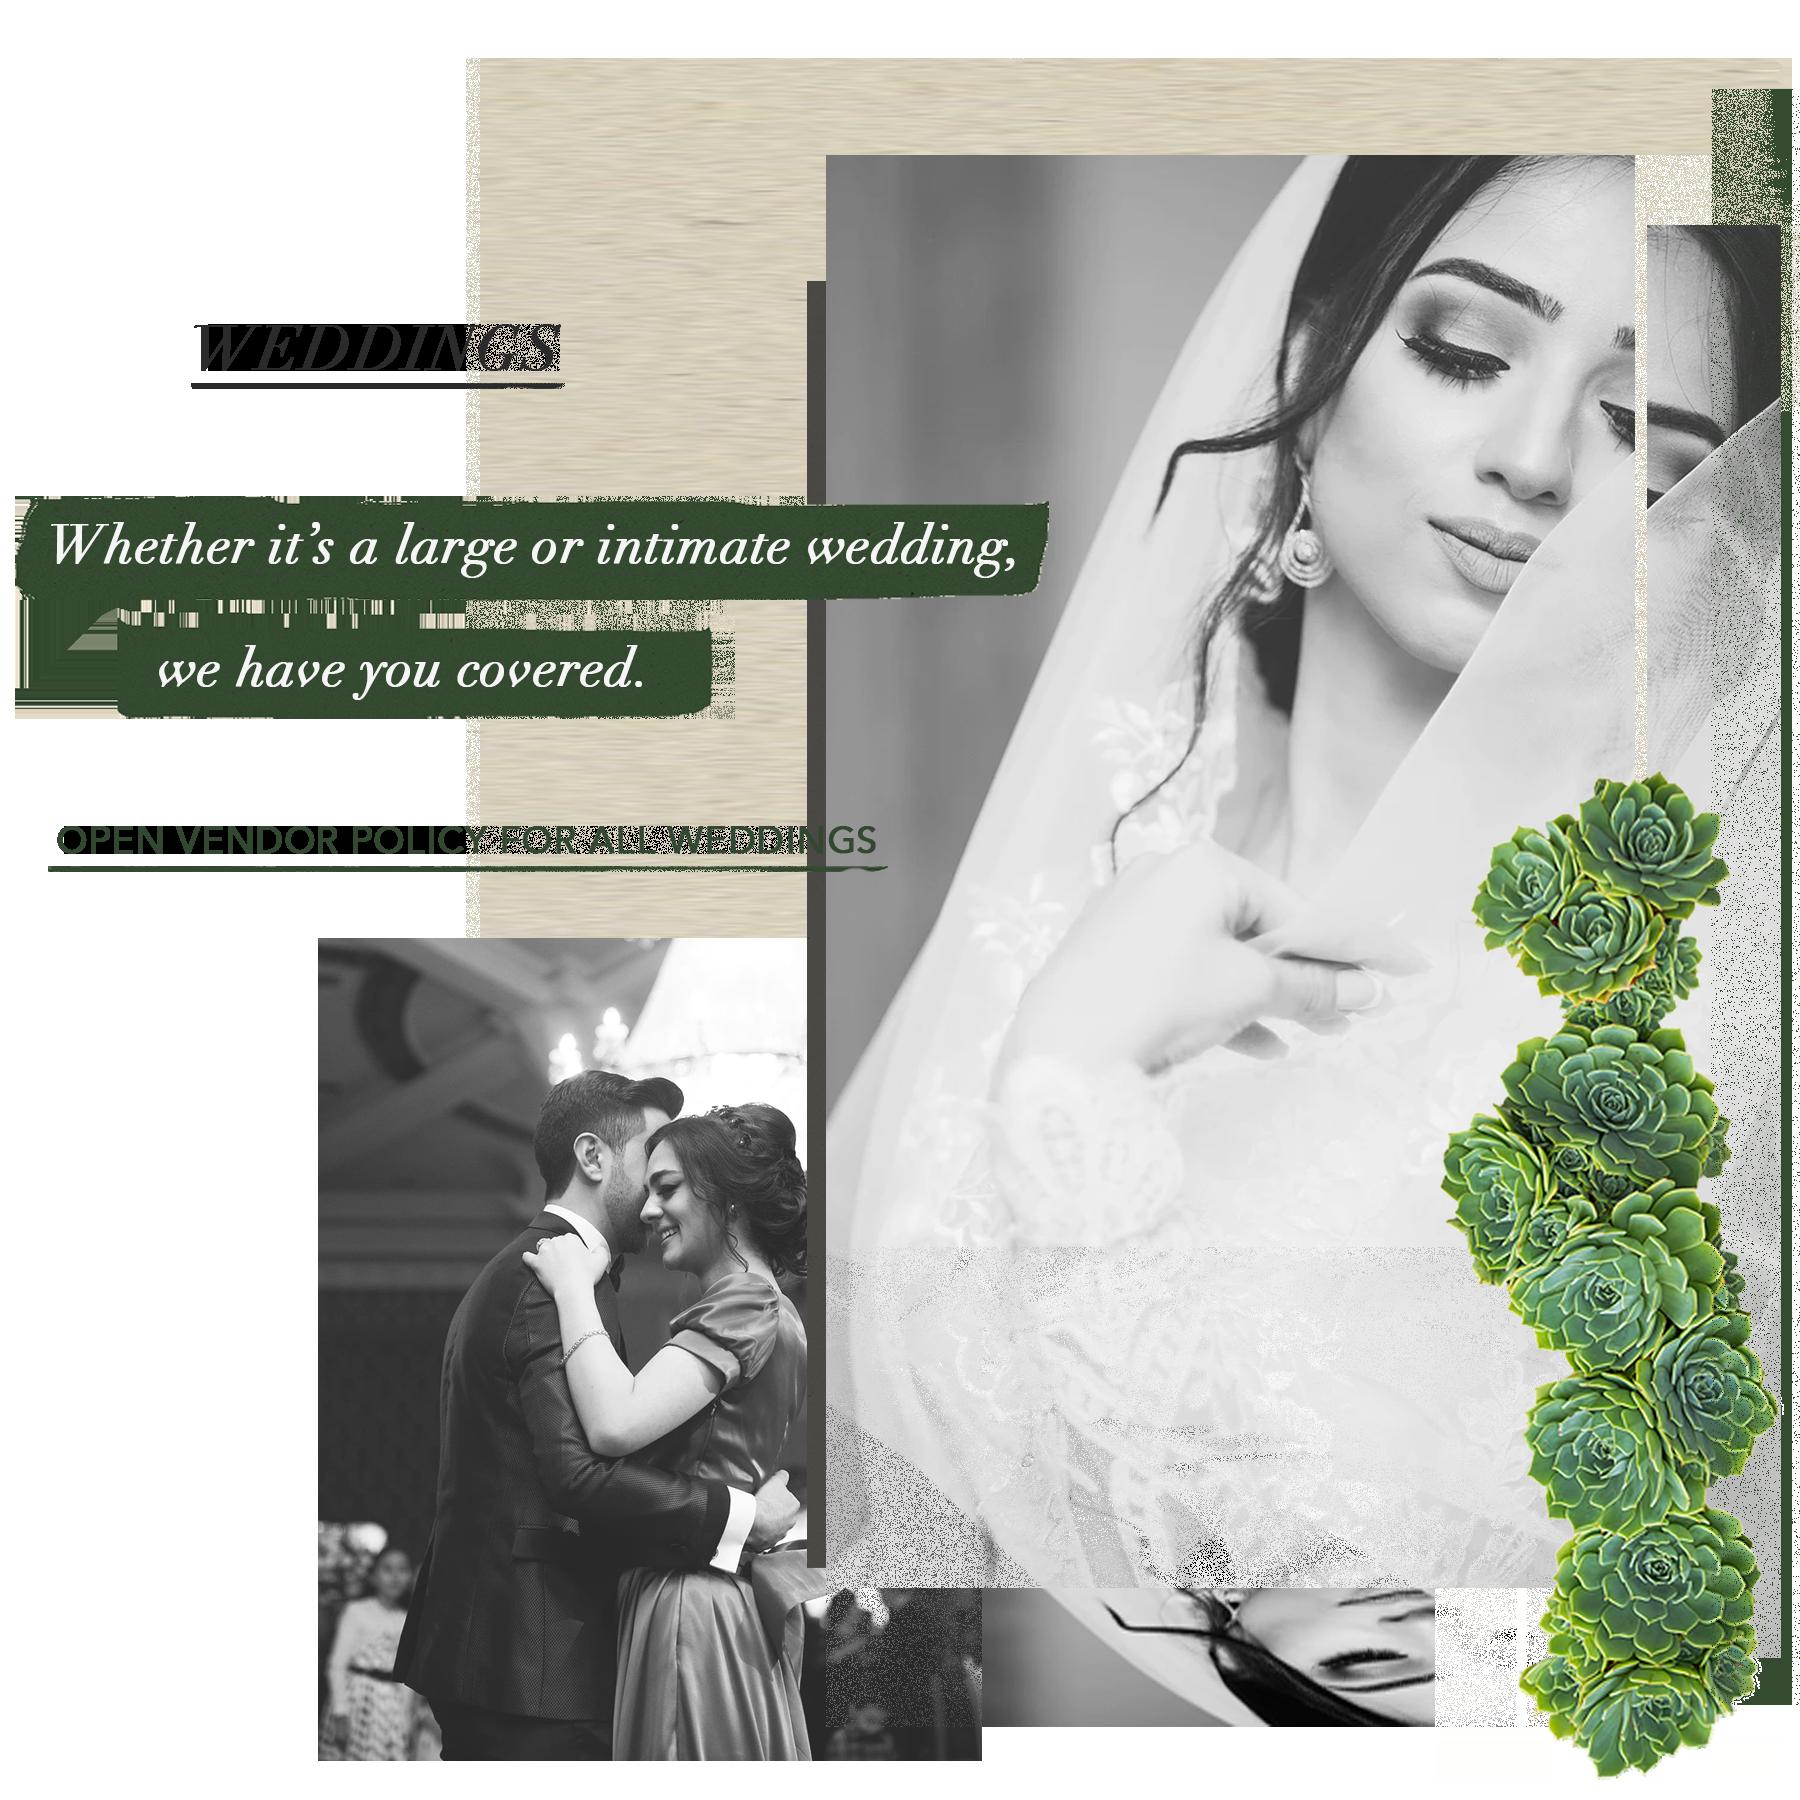 BVV_WebBLock_Weddings.png